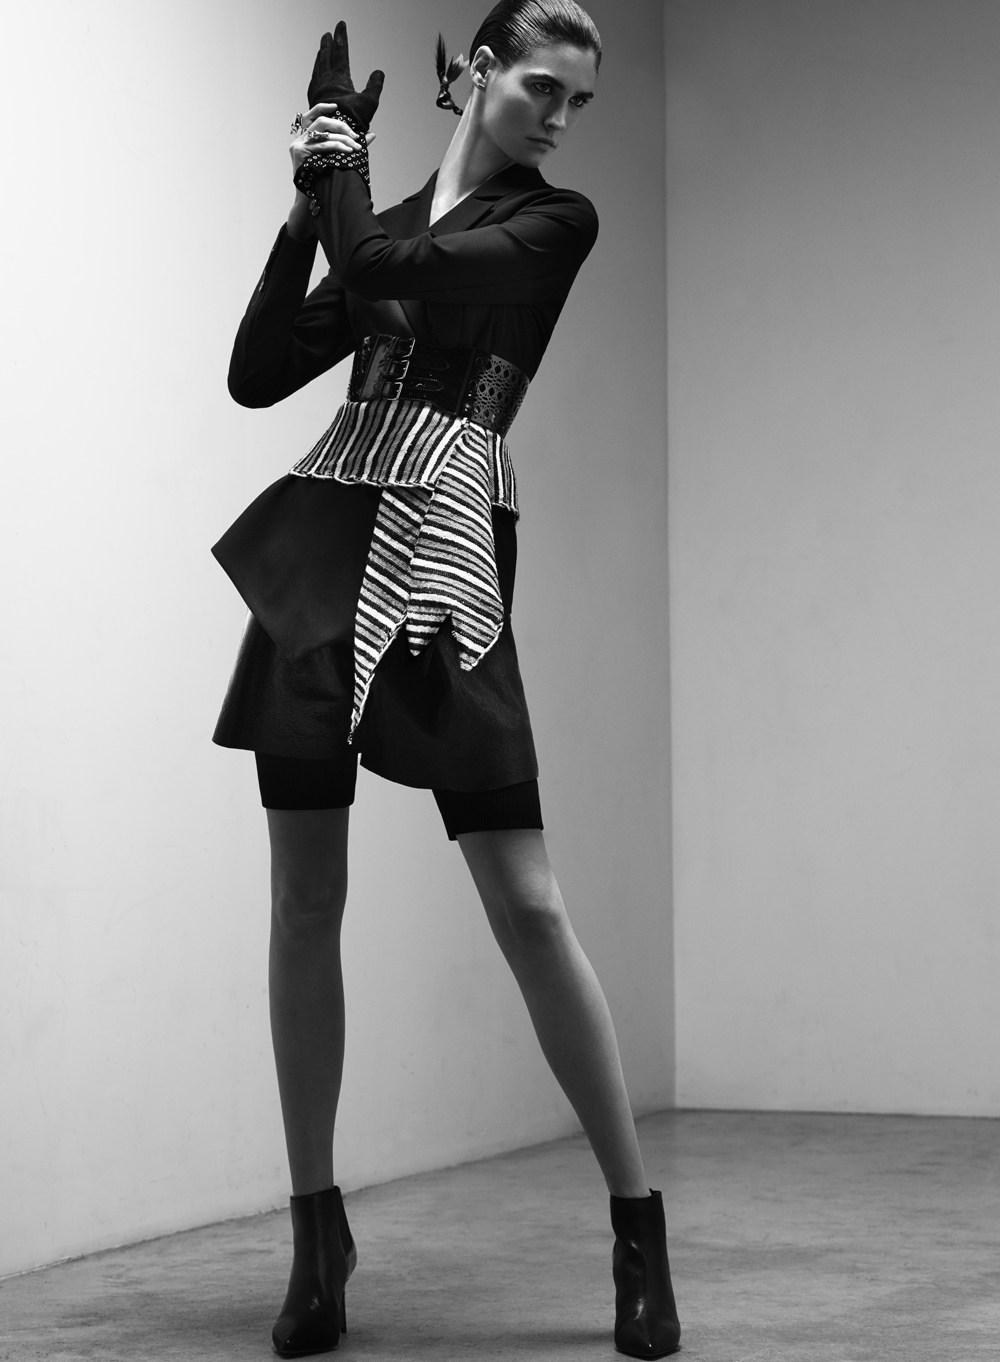 toby-knott-manon-leloup-stylist-magazine-4.jpg